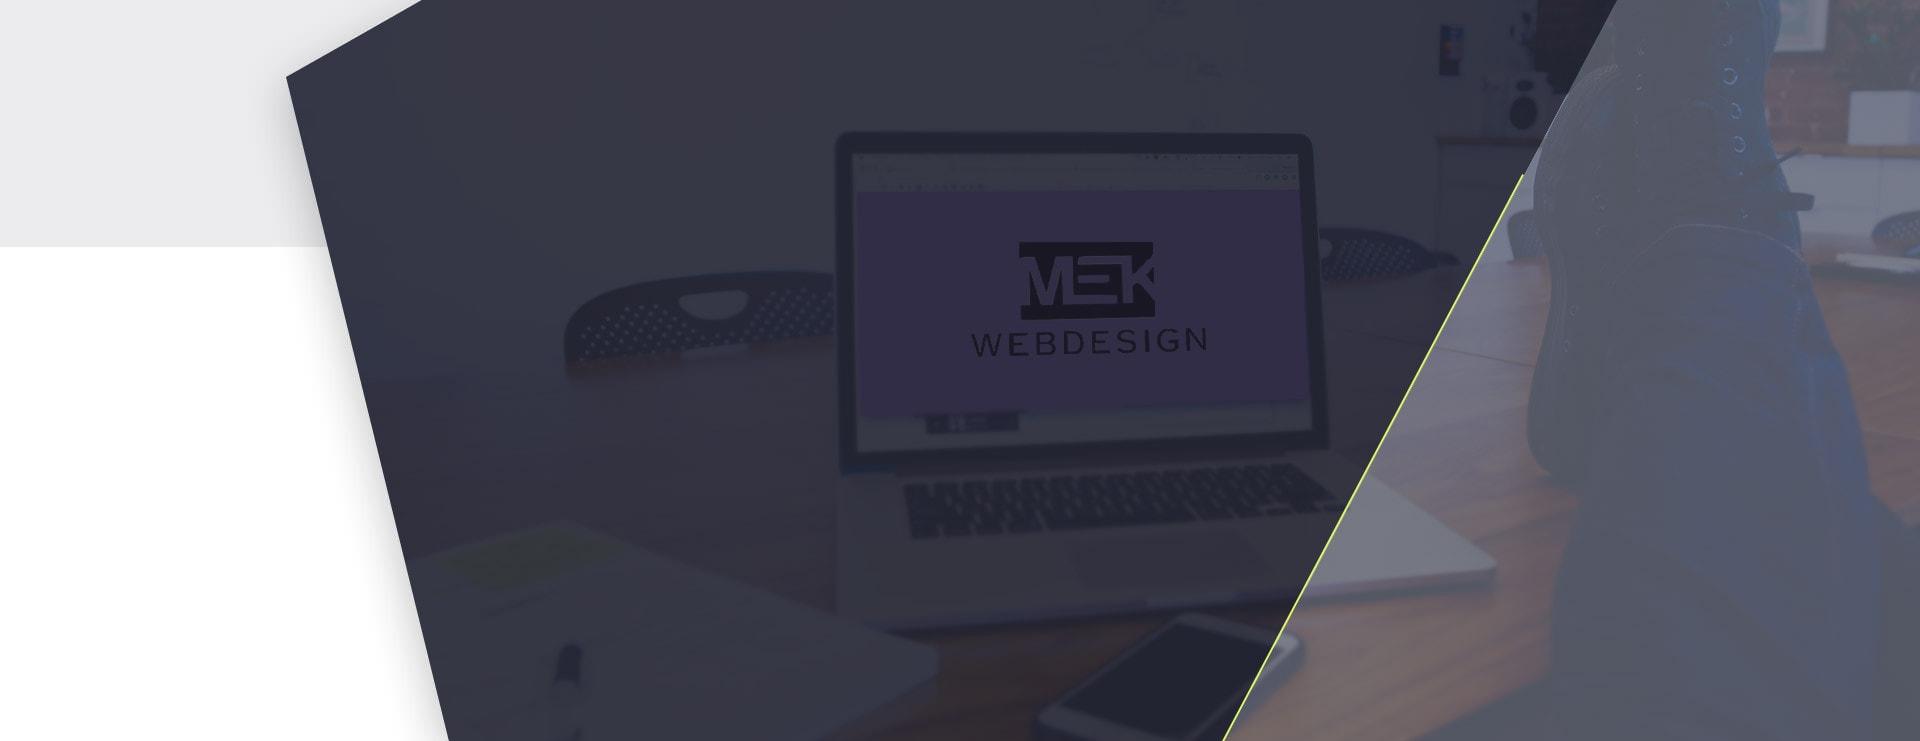 mek webdesign karlsruhe stuttgart mannheim pforzheim seo google